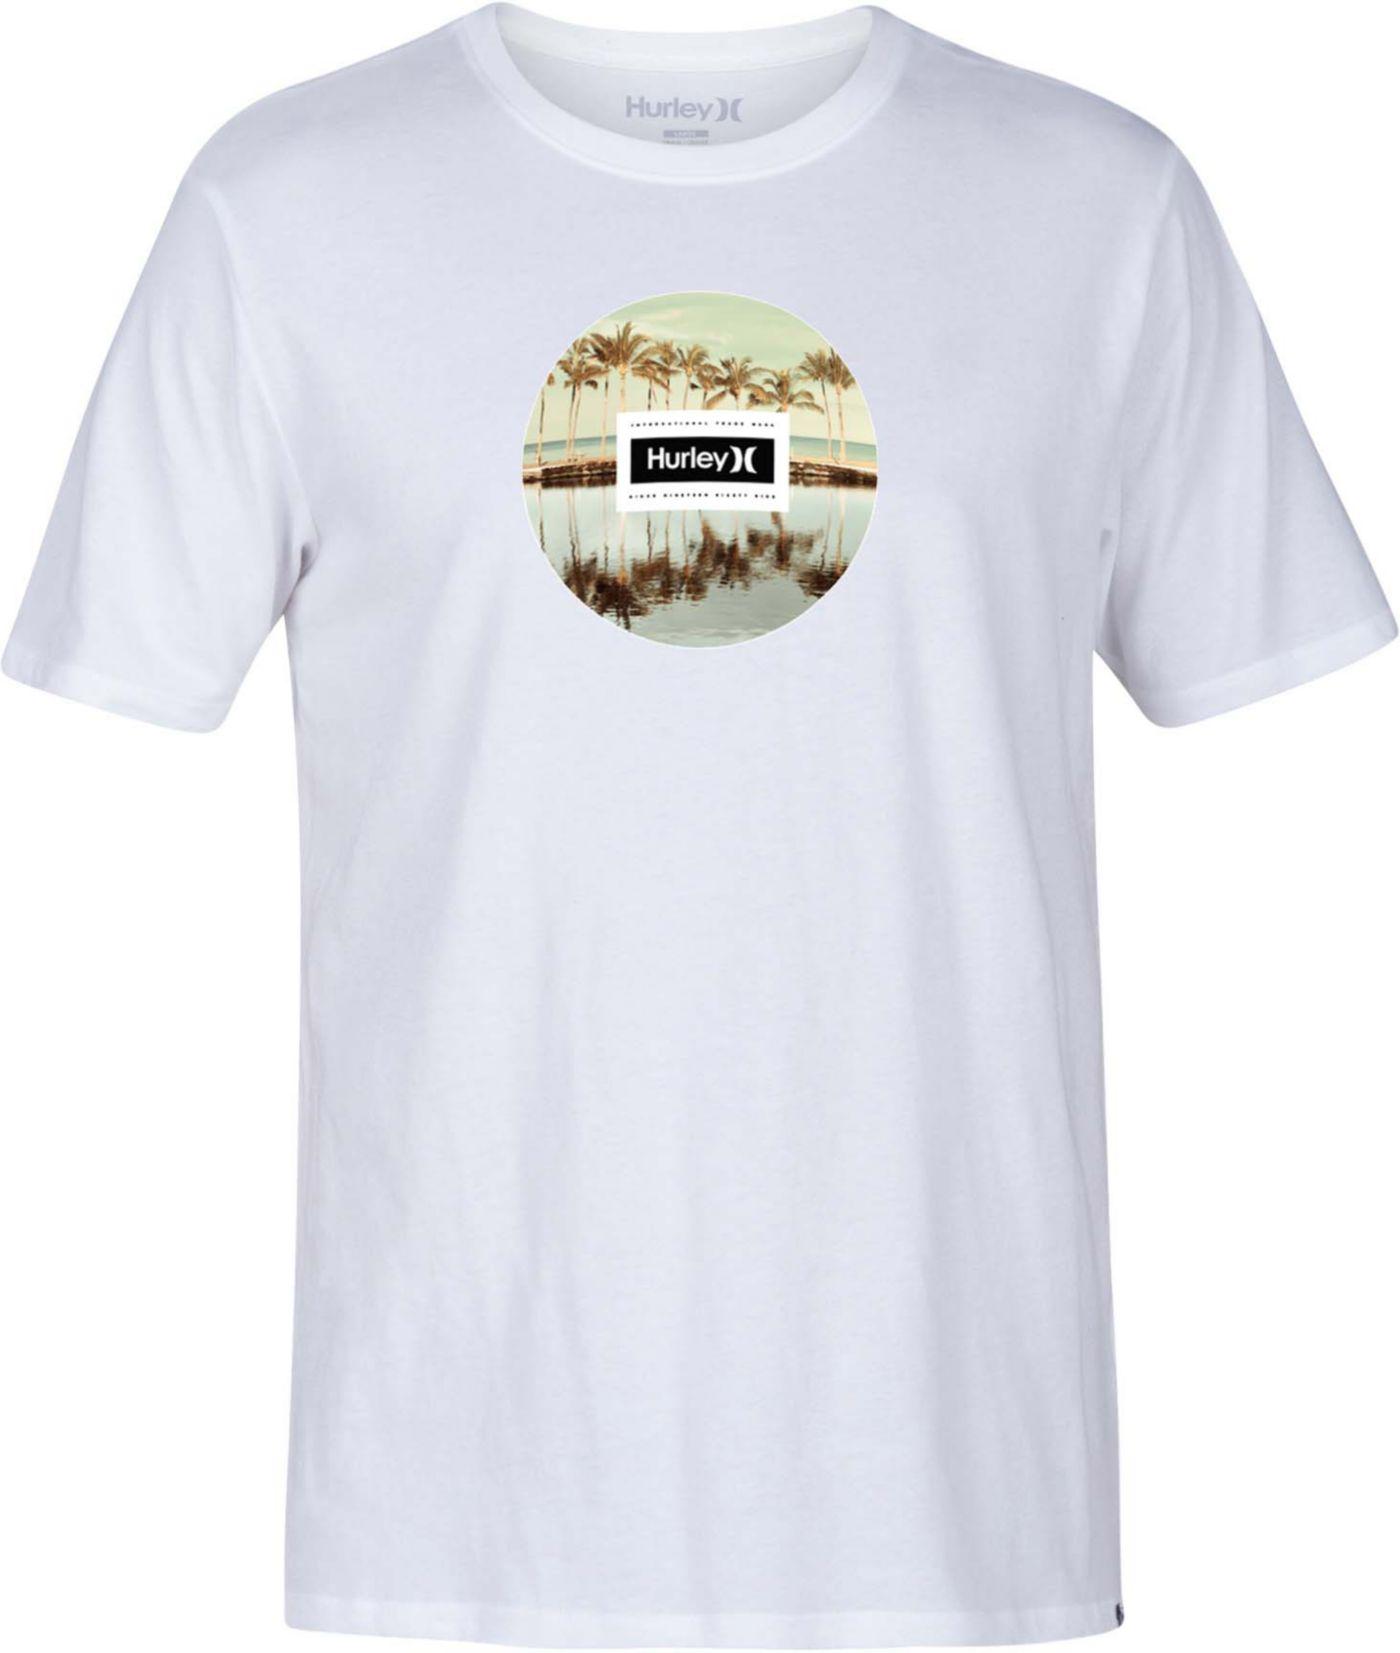 Hurley Men's Tropic Reflections Short Sleeve T-Shirt